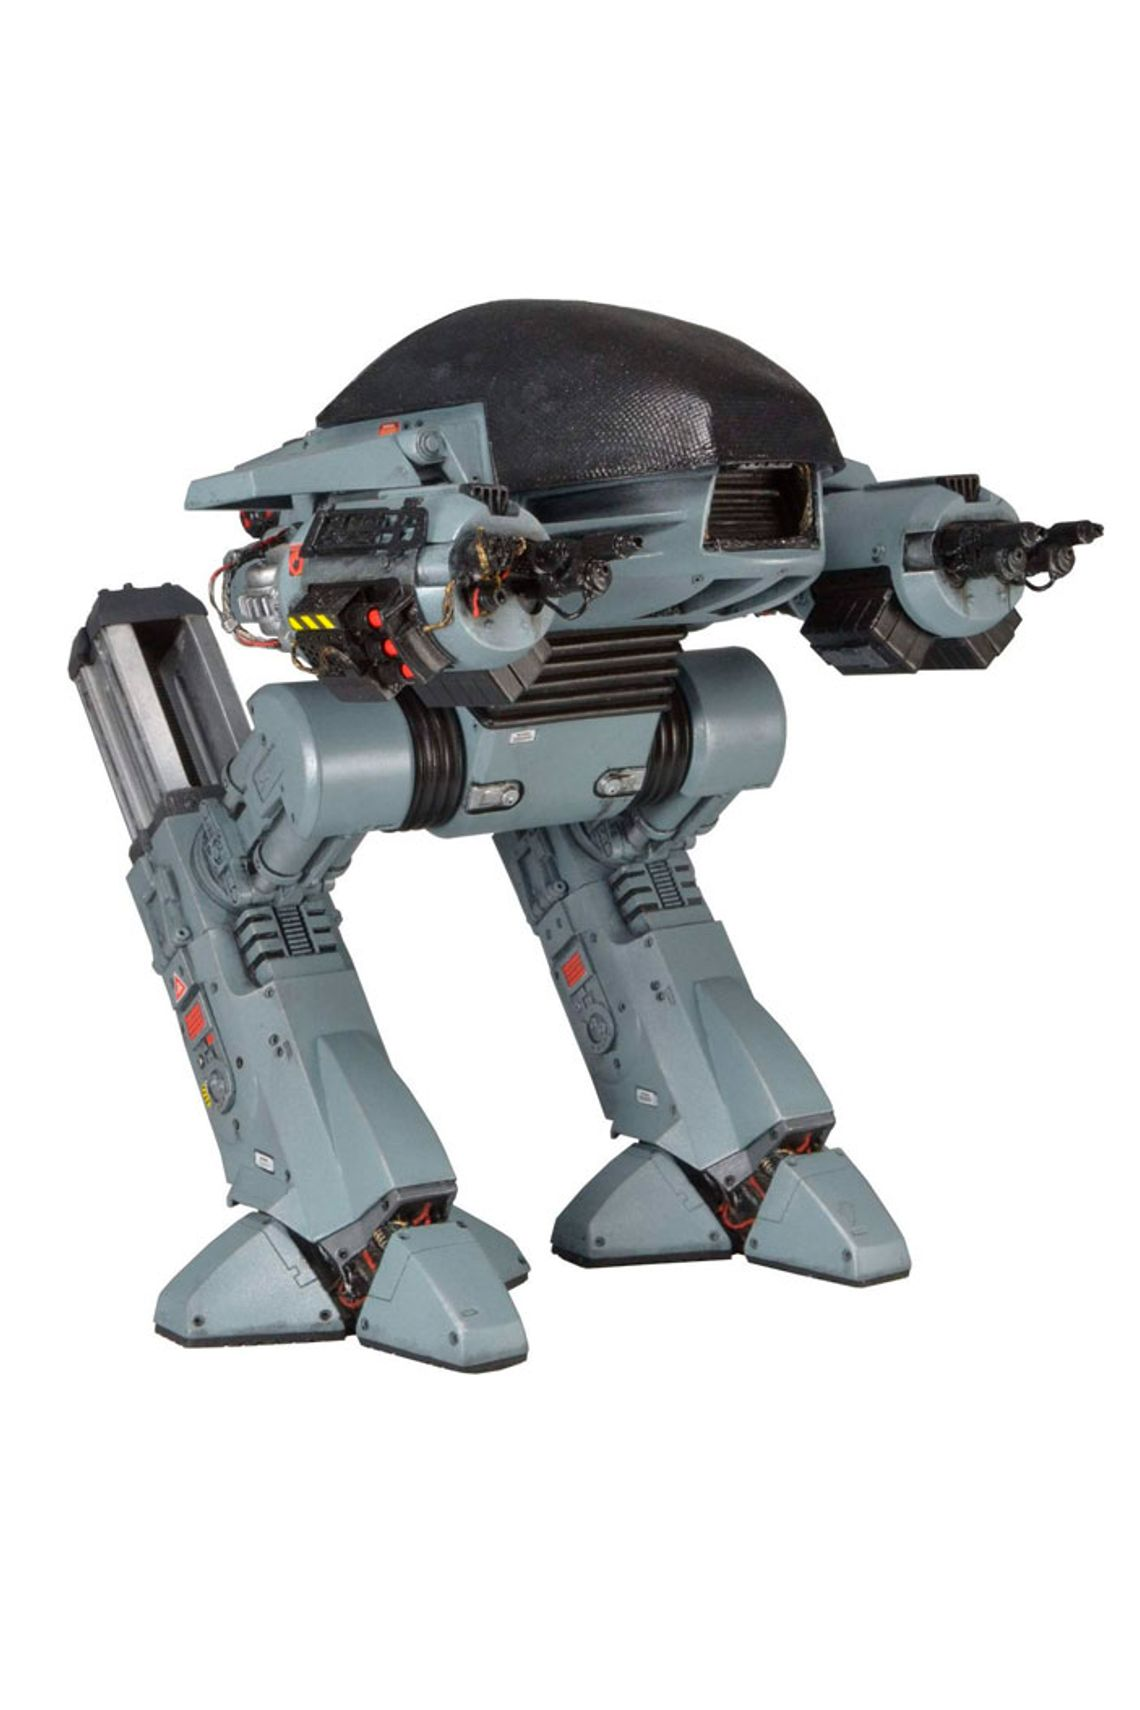 Robocop Ed 209 With Sound Action Figure Ironstudios